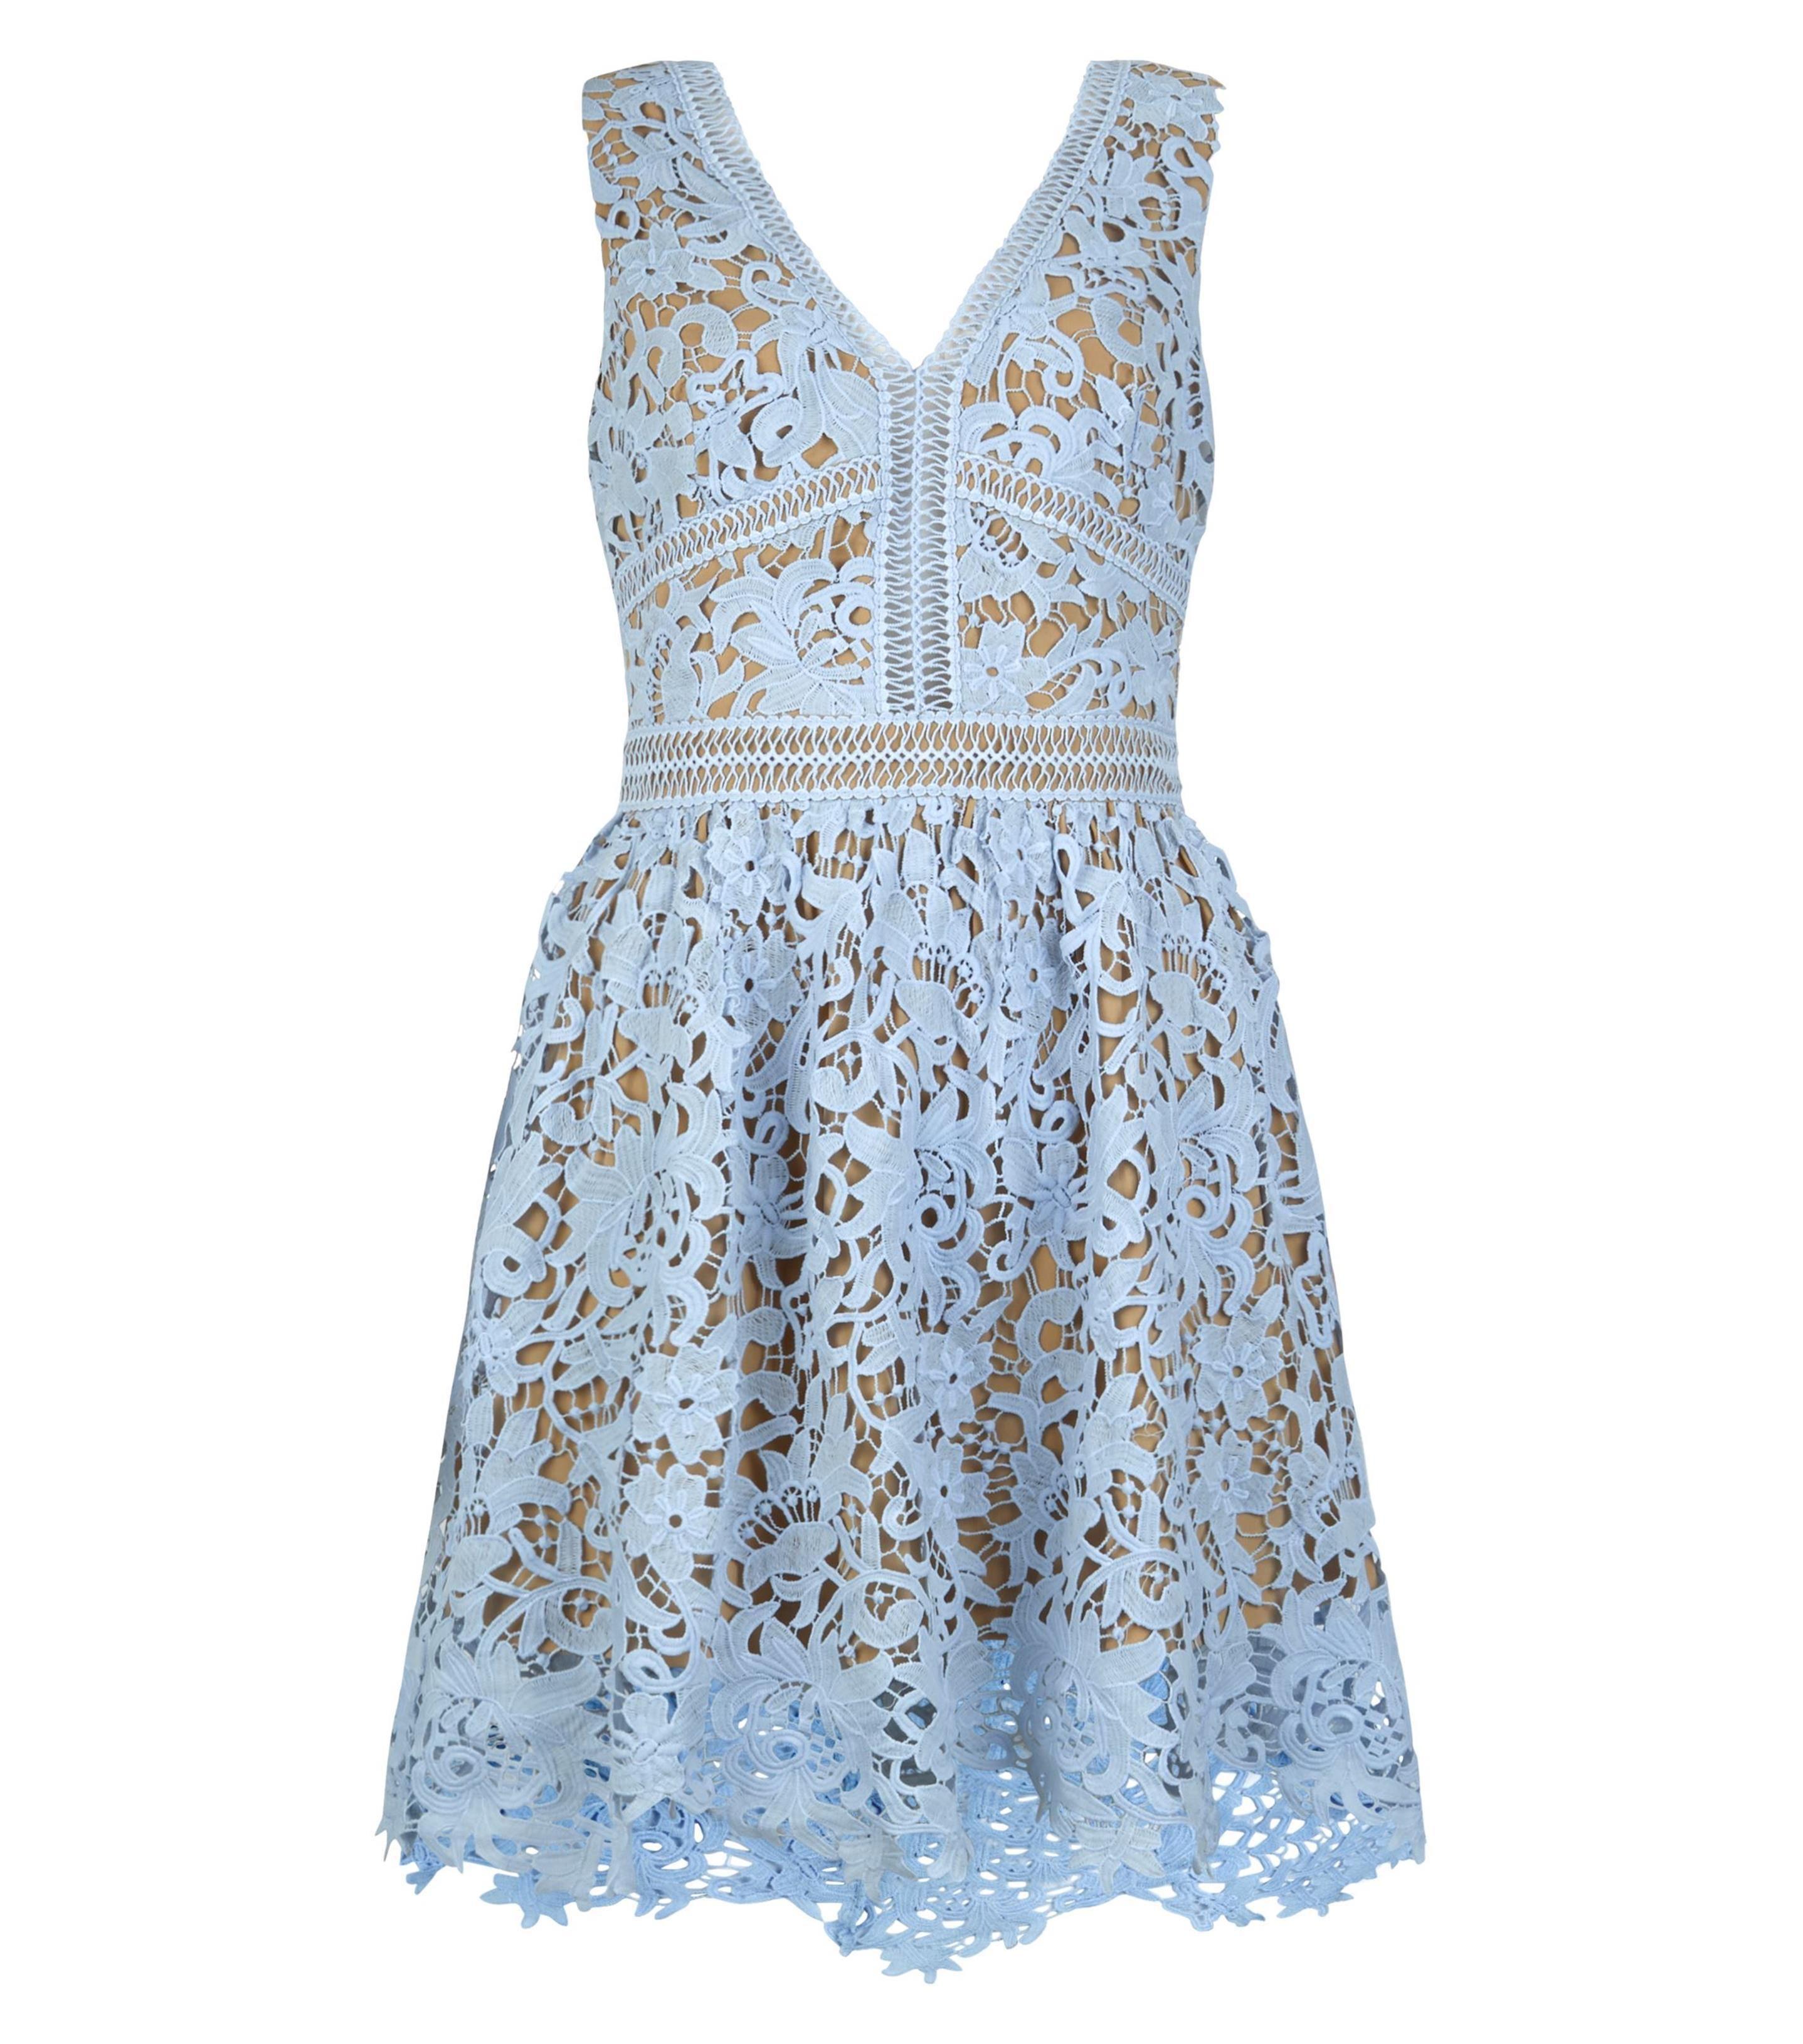 40 Beautiful Outdoor Summer Wedding Dresses for Guest   Summer ...